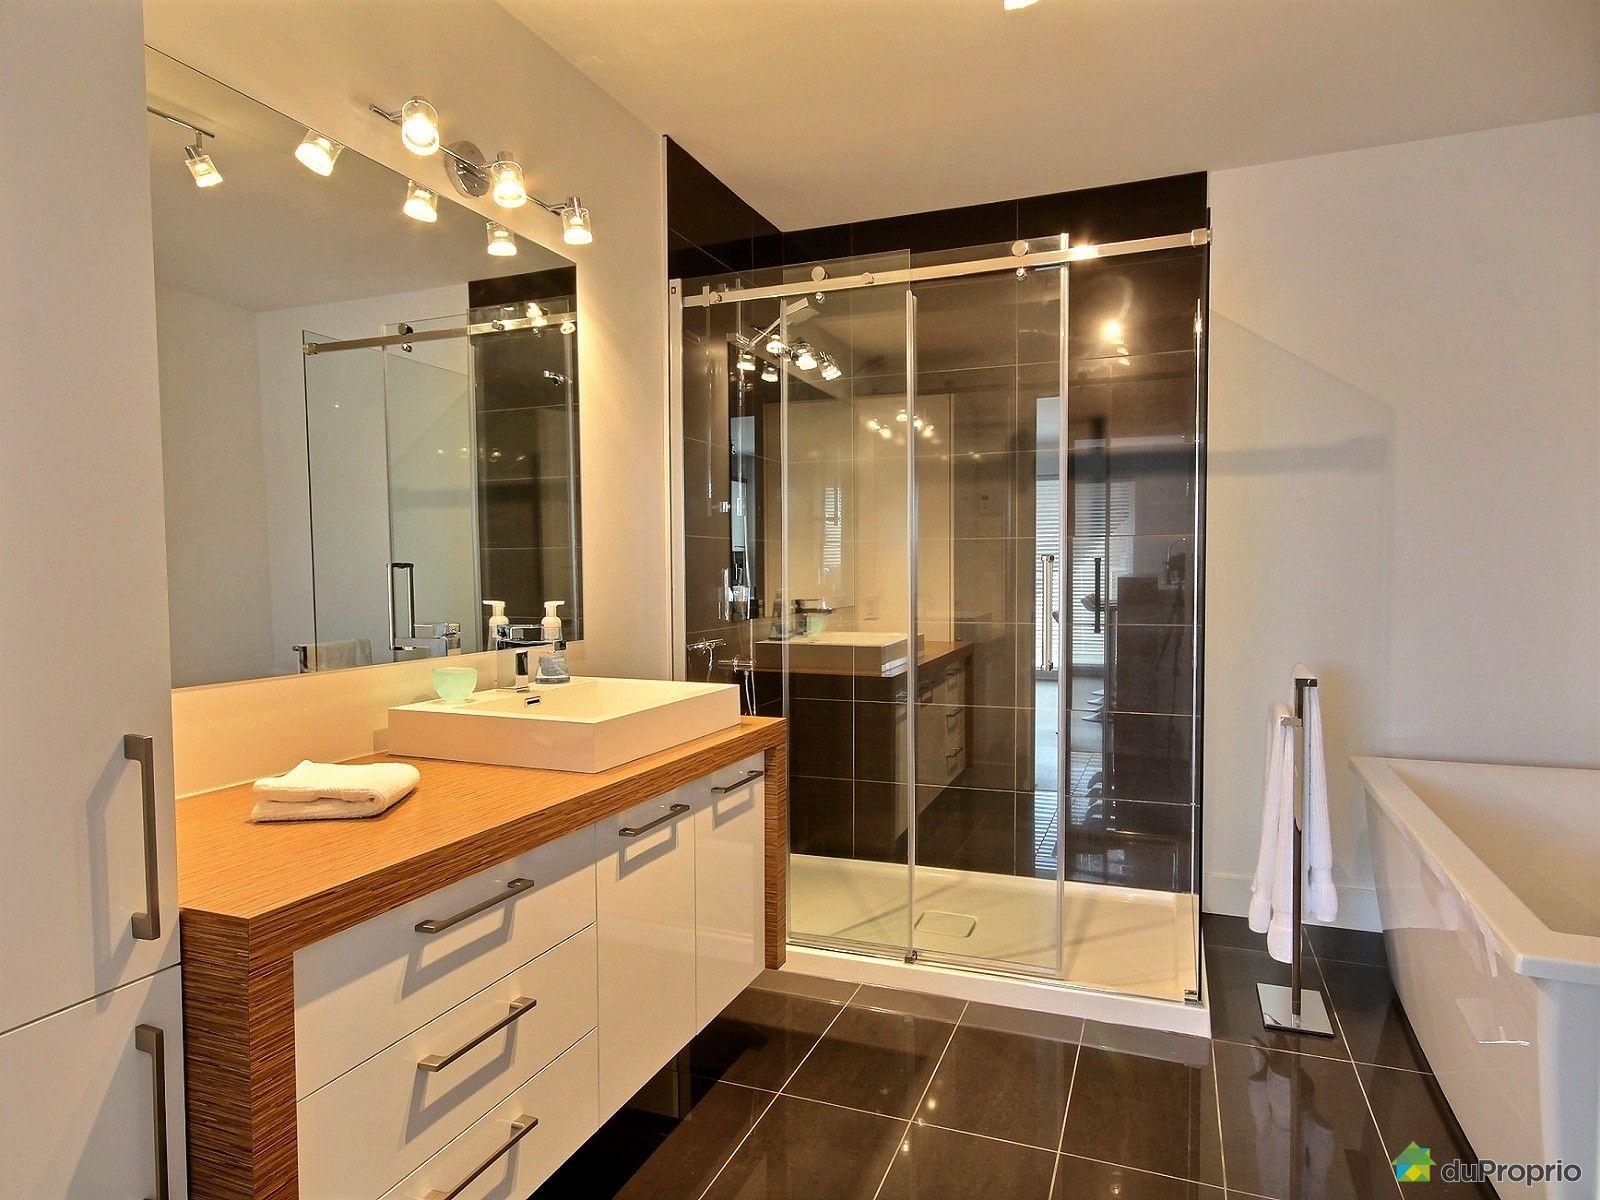 Condo vendu lebourgneuf immobilier qu bec duproprio - Configuration salle de bain ...